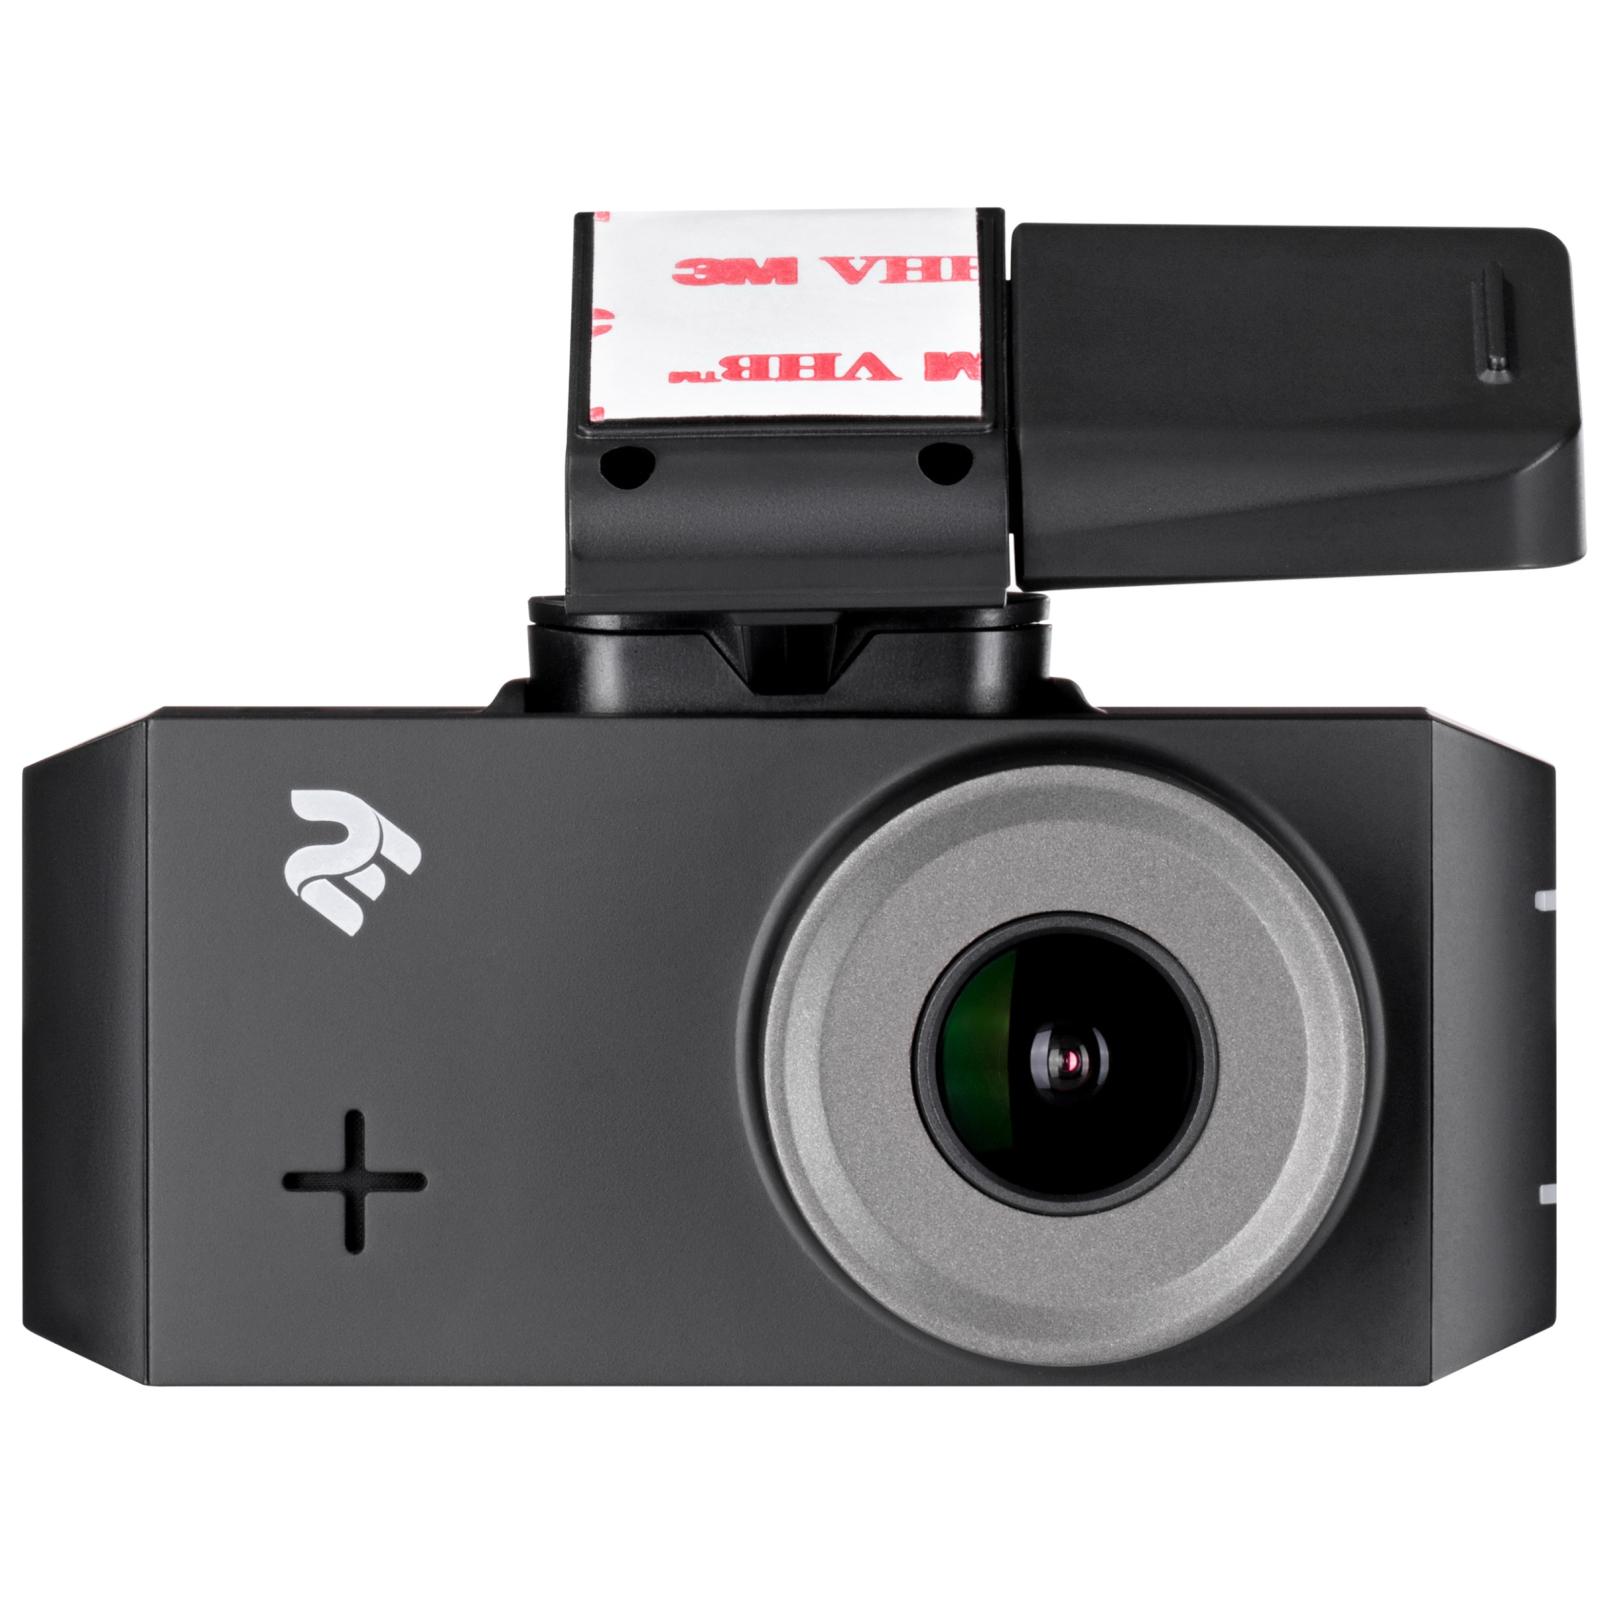 Відеореєстратор 2E Drive 700 Magnet (2E-DRIVE700MAGNET) зображення 2